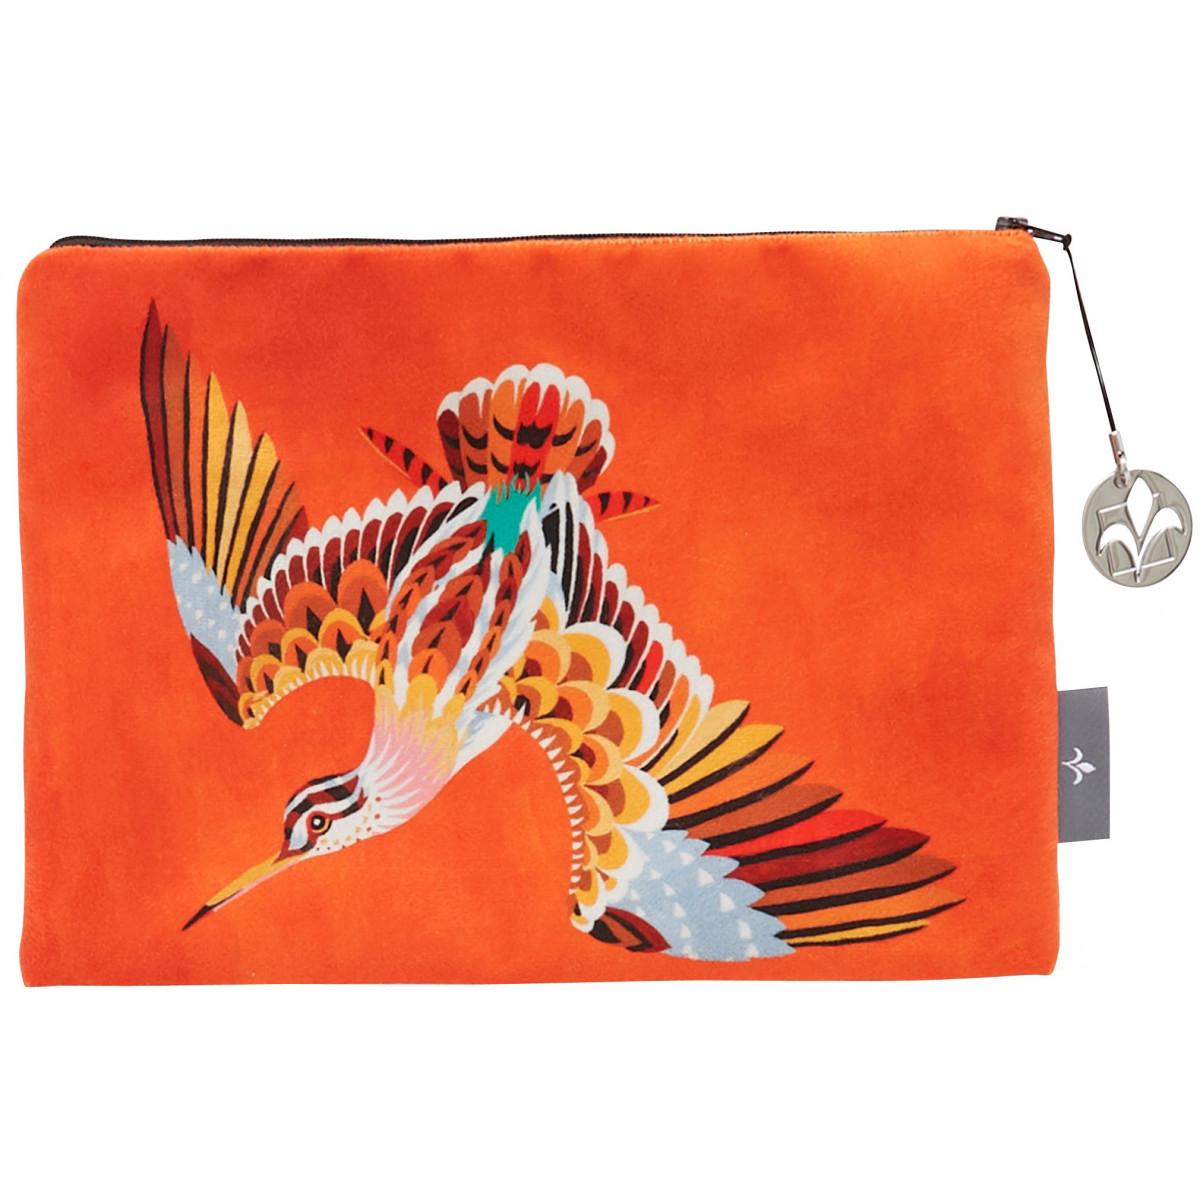 Trousse bécasse velours orange 27x17